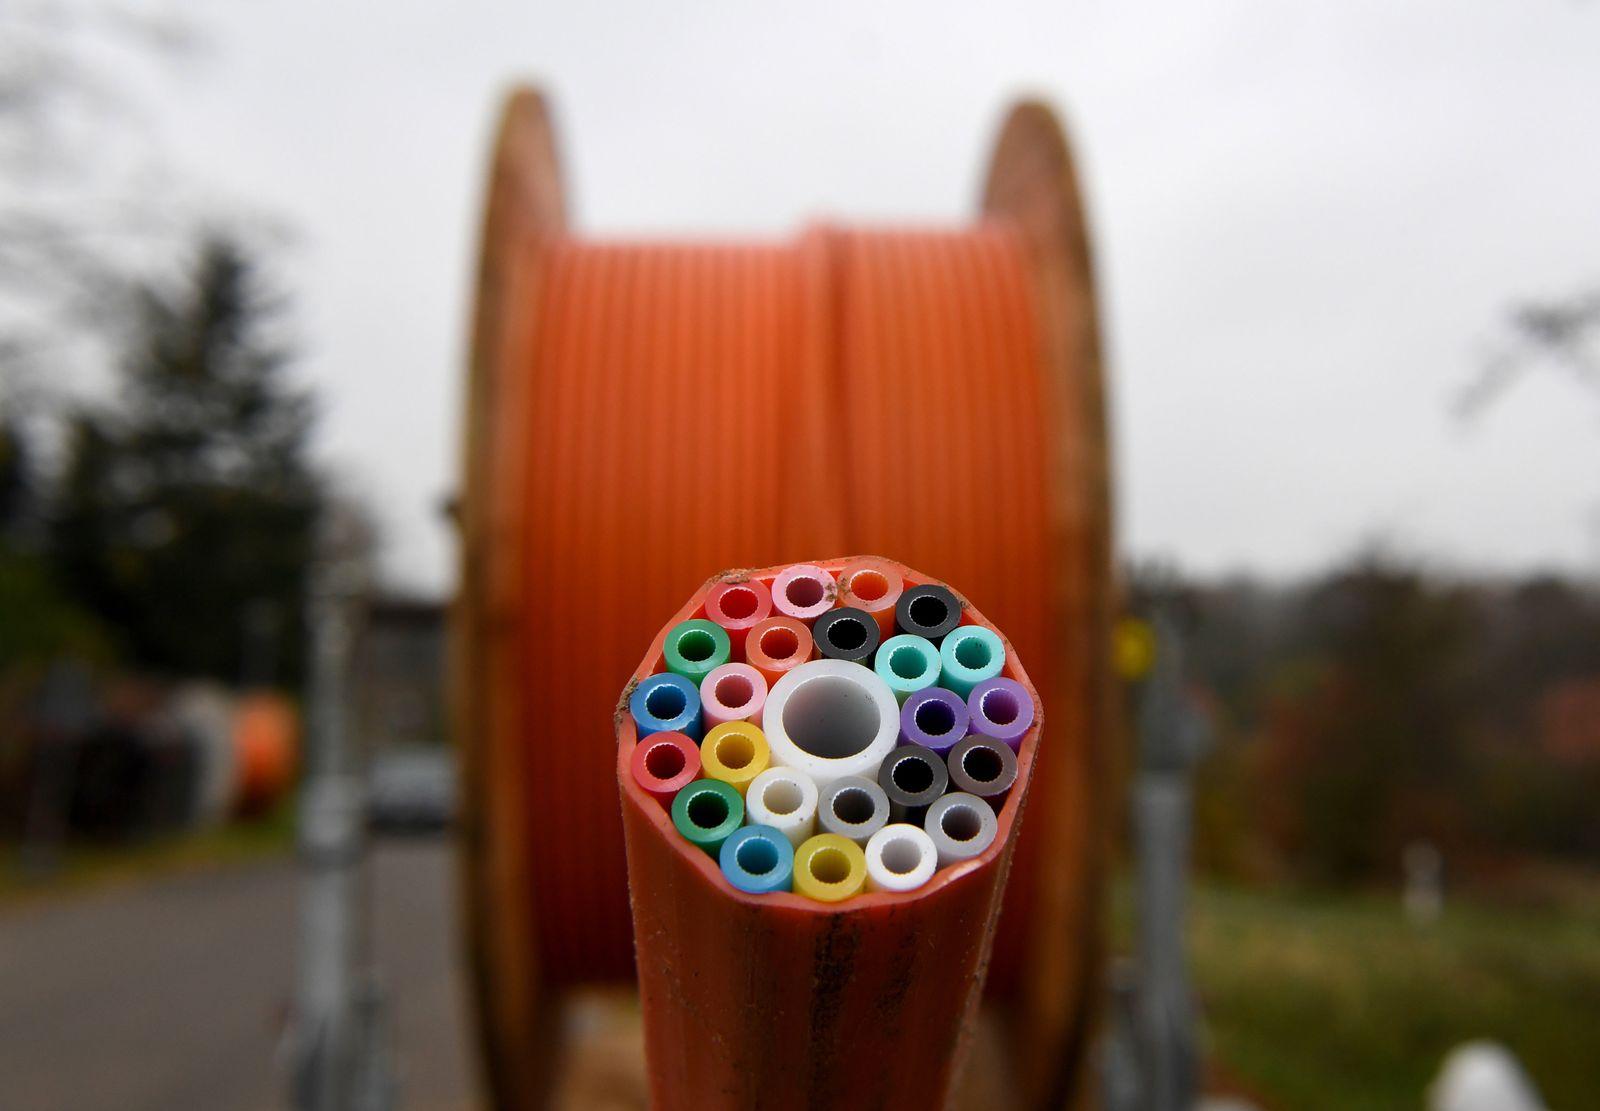 Leitungen Breitbandkabel / Breitbandausbau